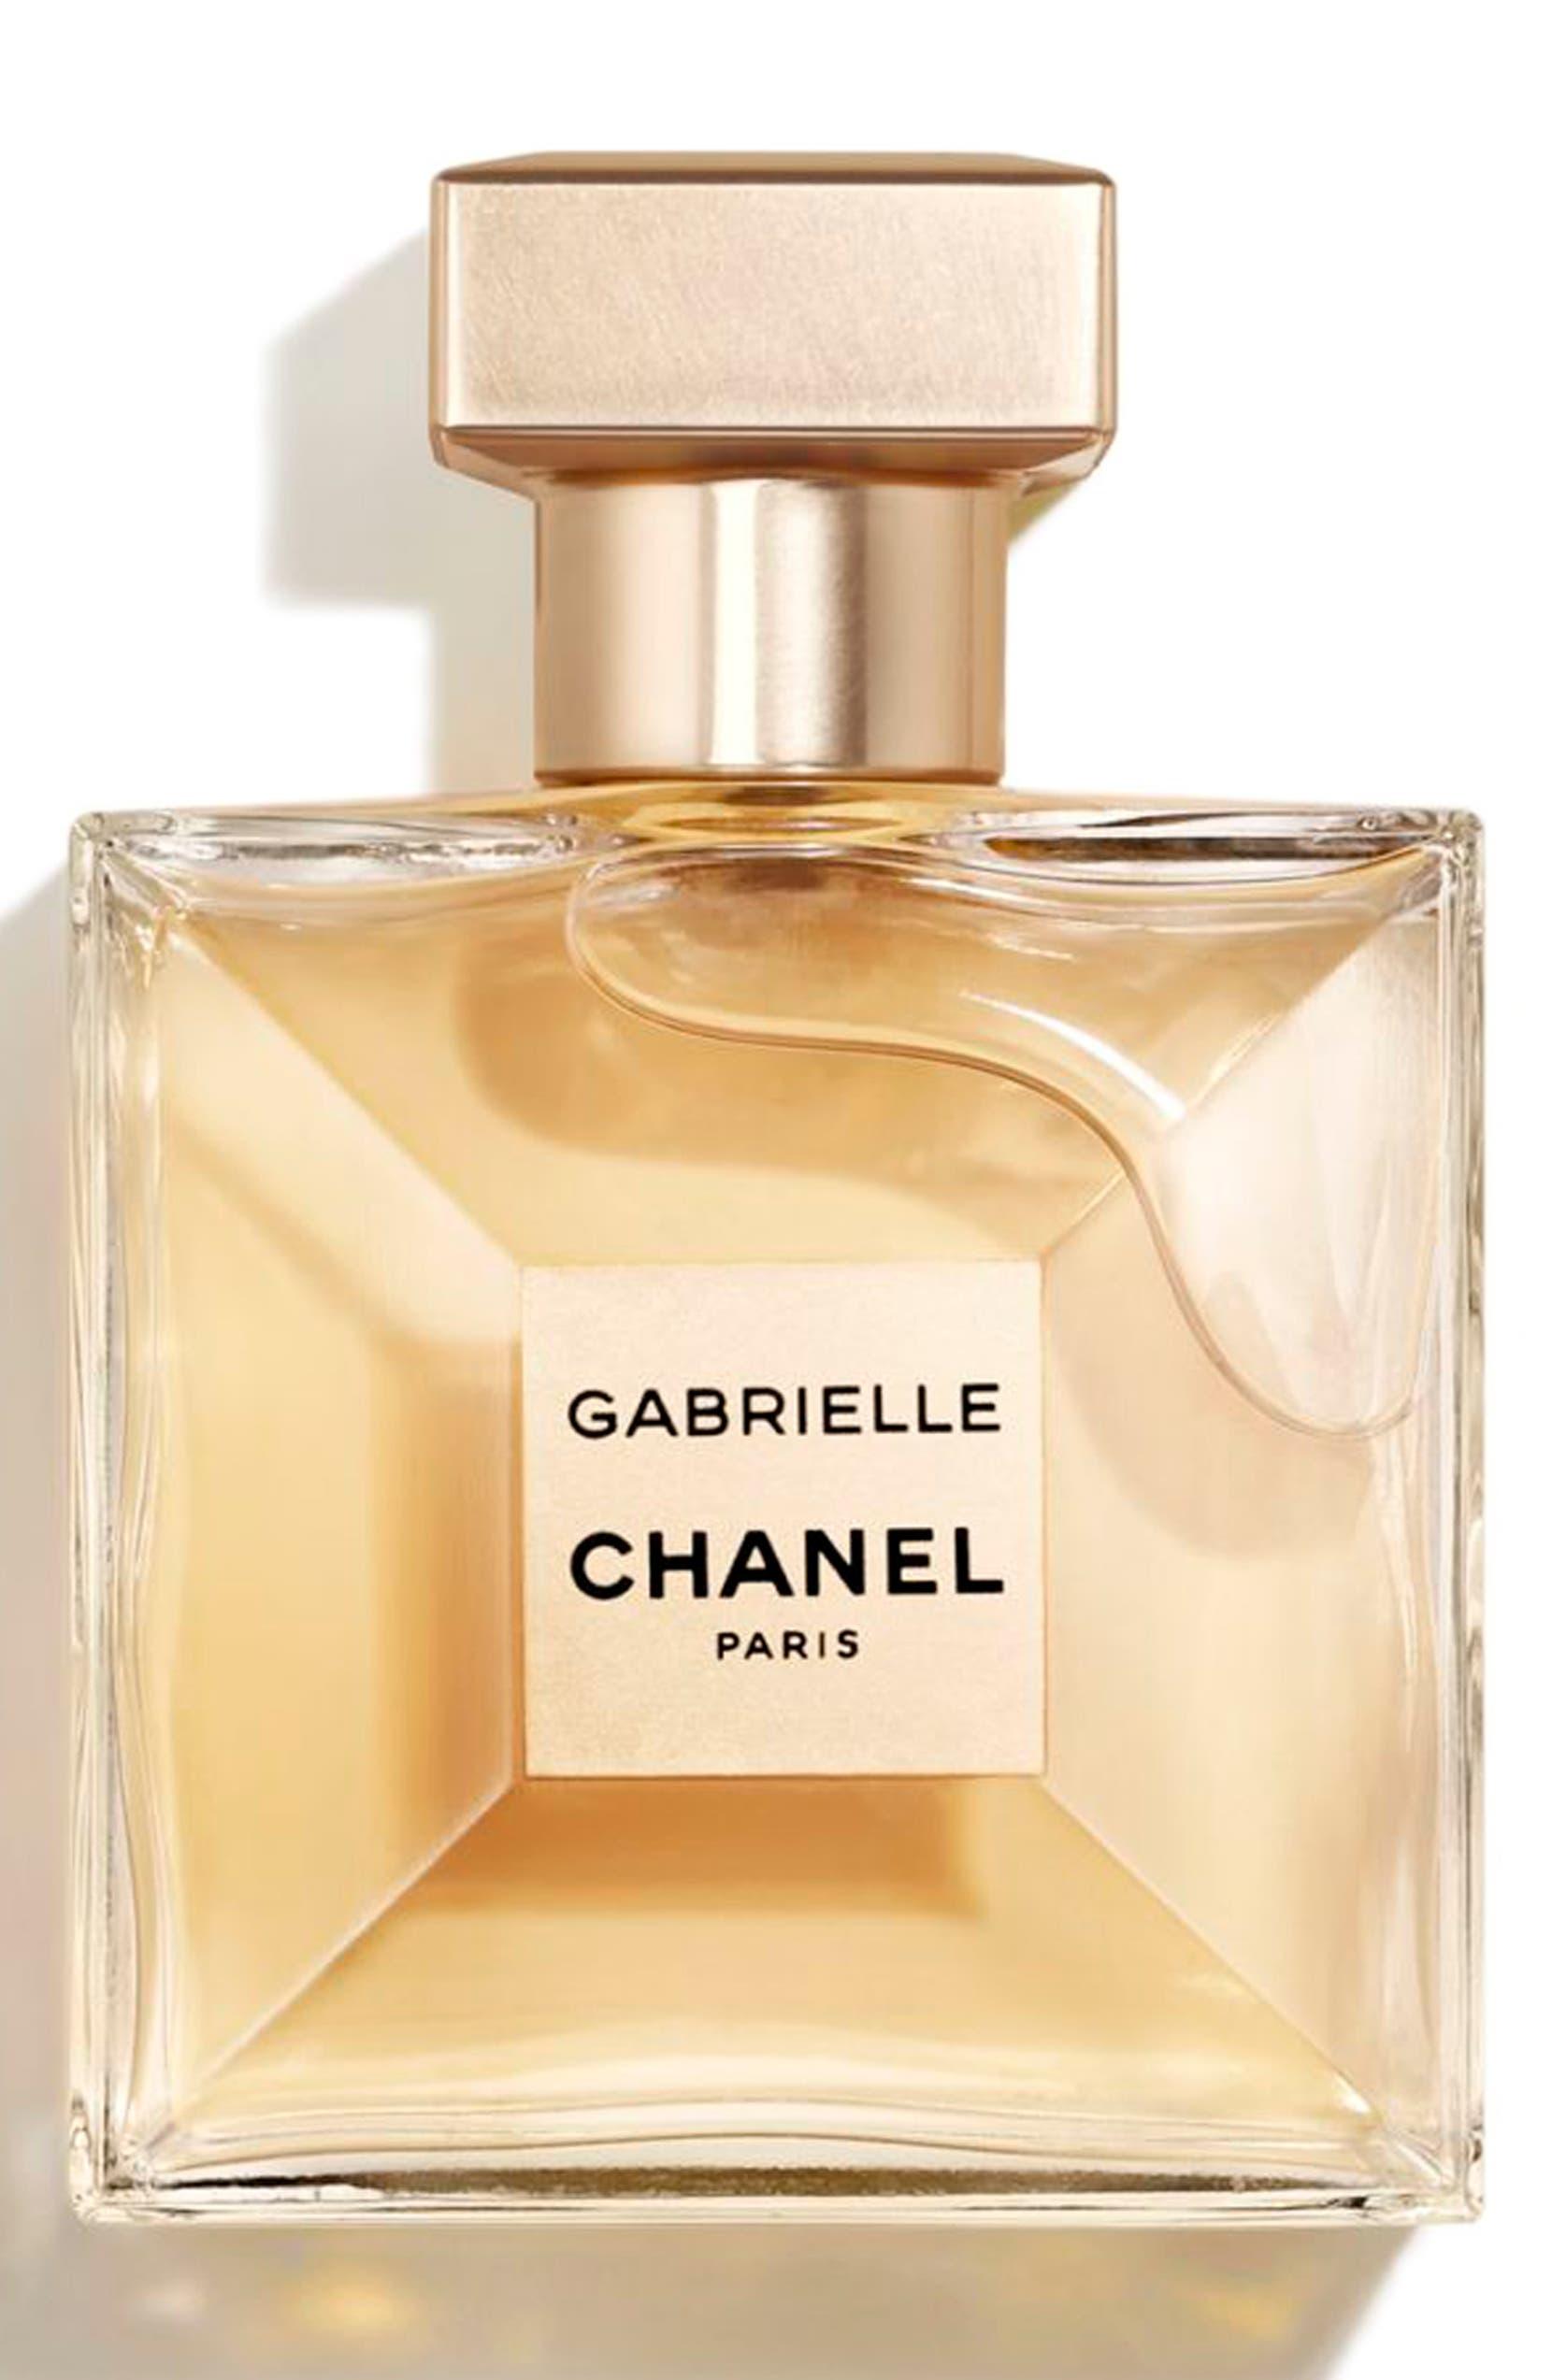 GABRIELLE CHANEL Eau de Parfum Spray 158f448a6d117